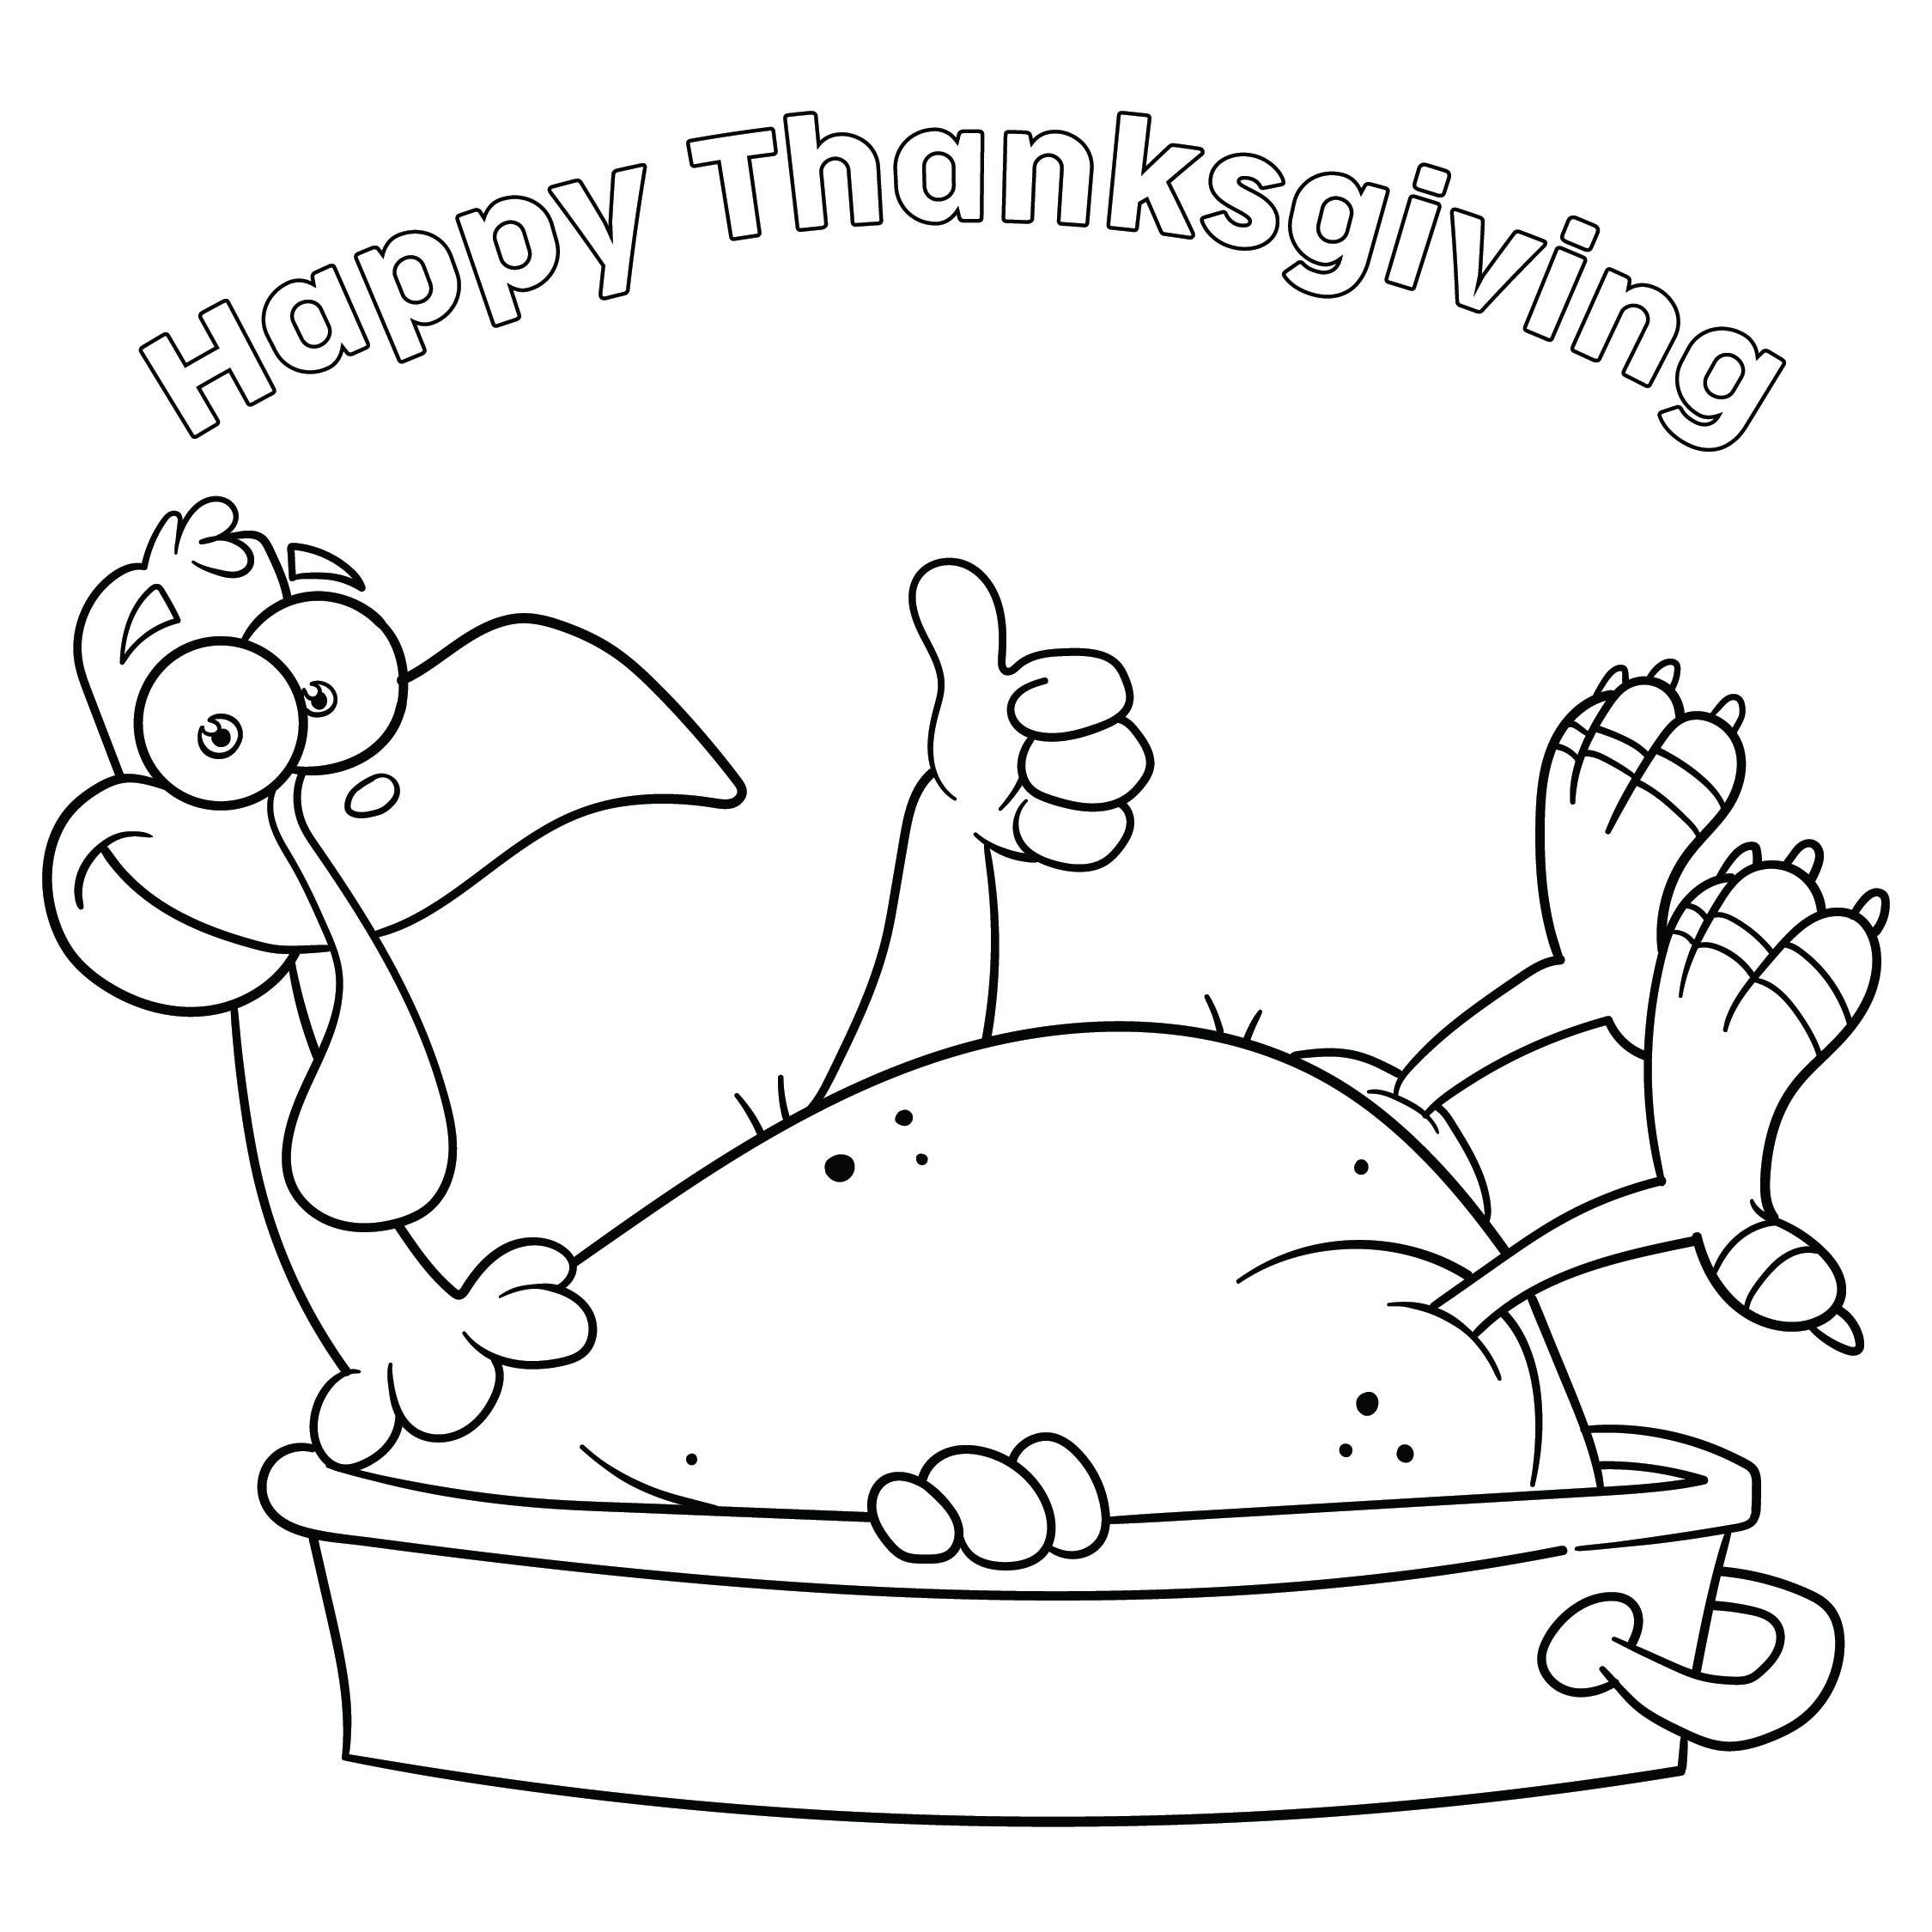 number names worksheets fun activities worksheets thanksgiving fun worksheets free intrepidpath - Fun Activity Sheets